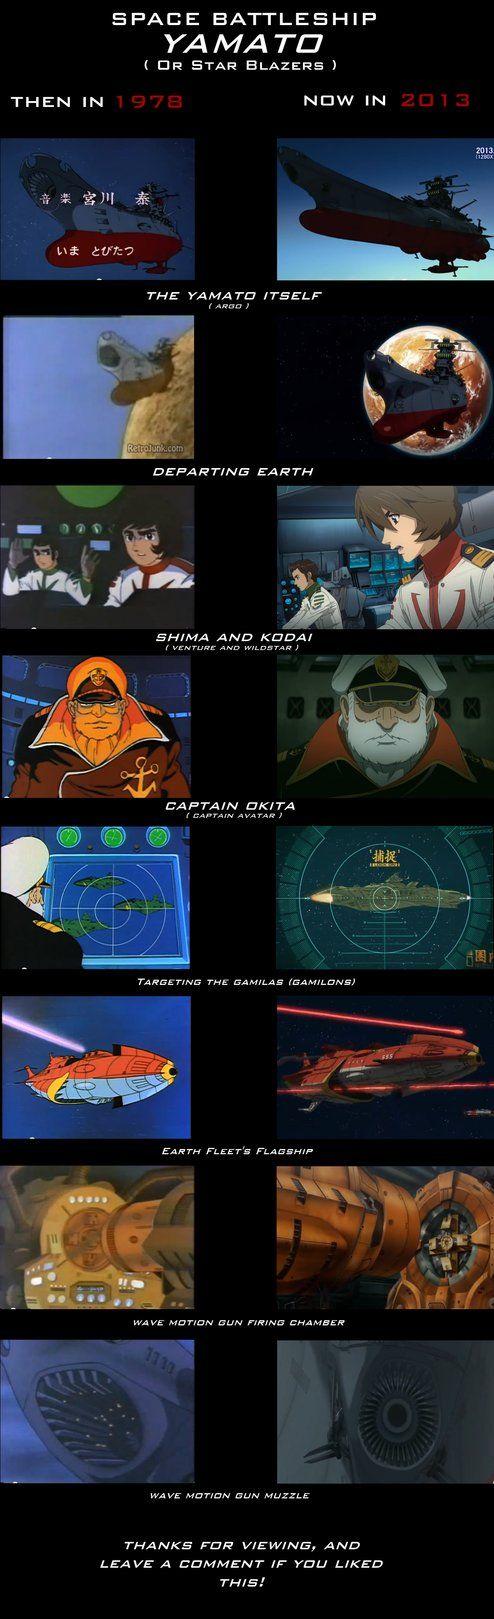 Evolution of Space Battleship Yamato (Star Blazer) by StrikeFire